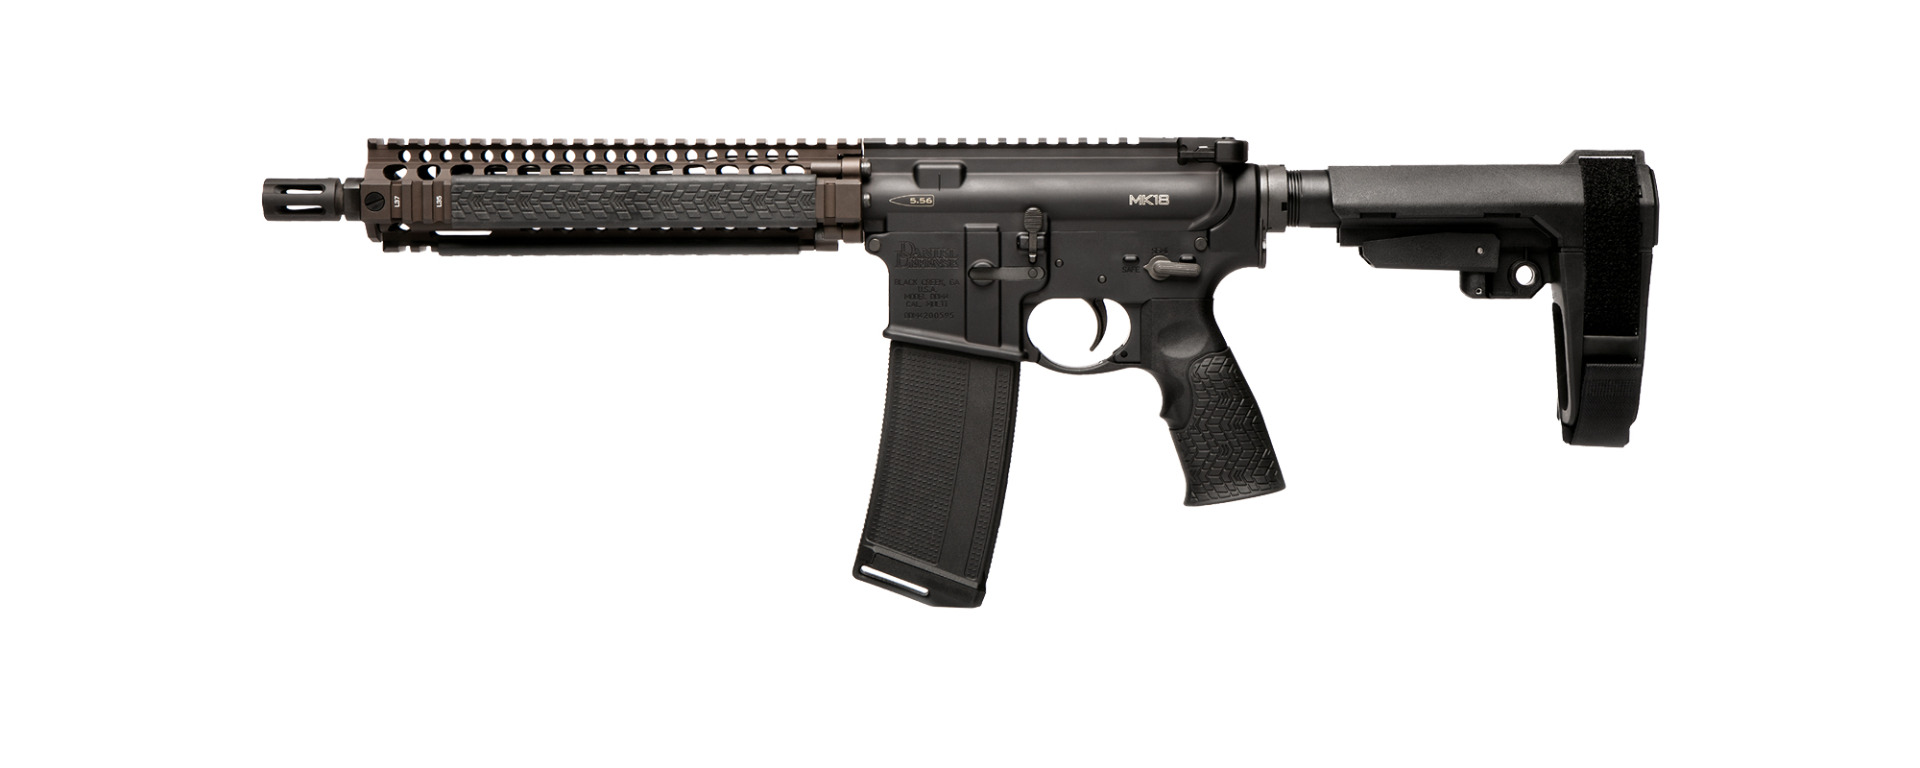 Daniel Defense MK18 Pistol Flat Dark Earth - Left